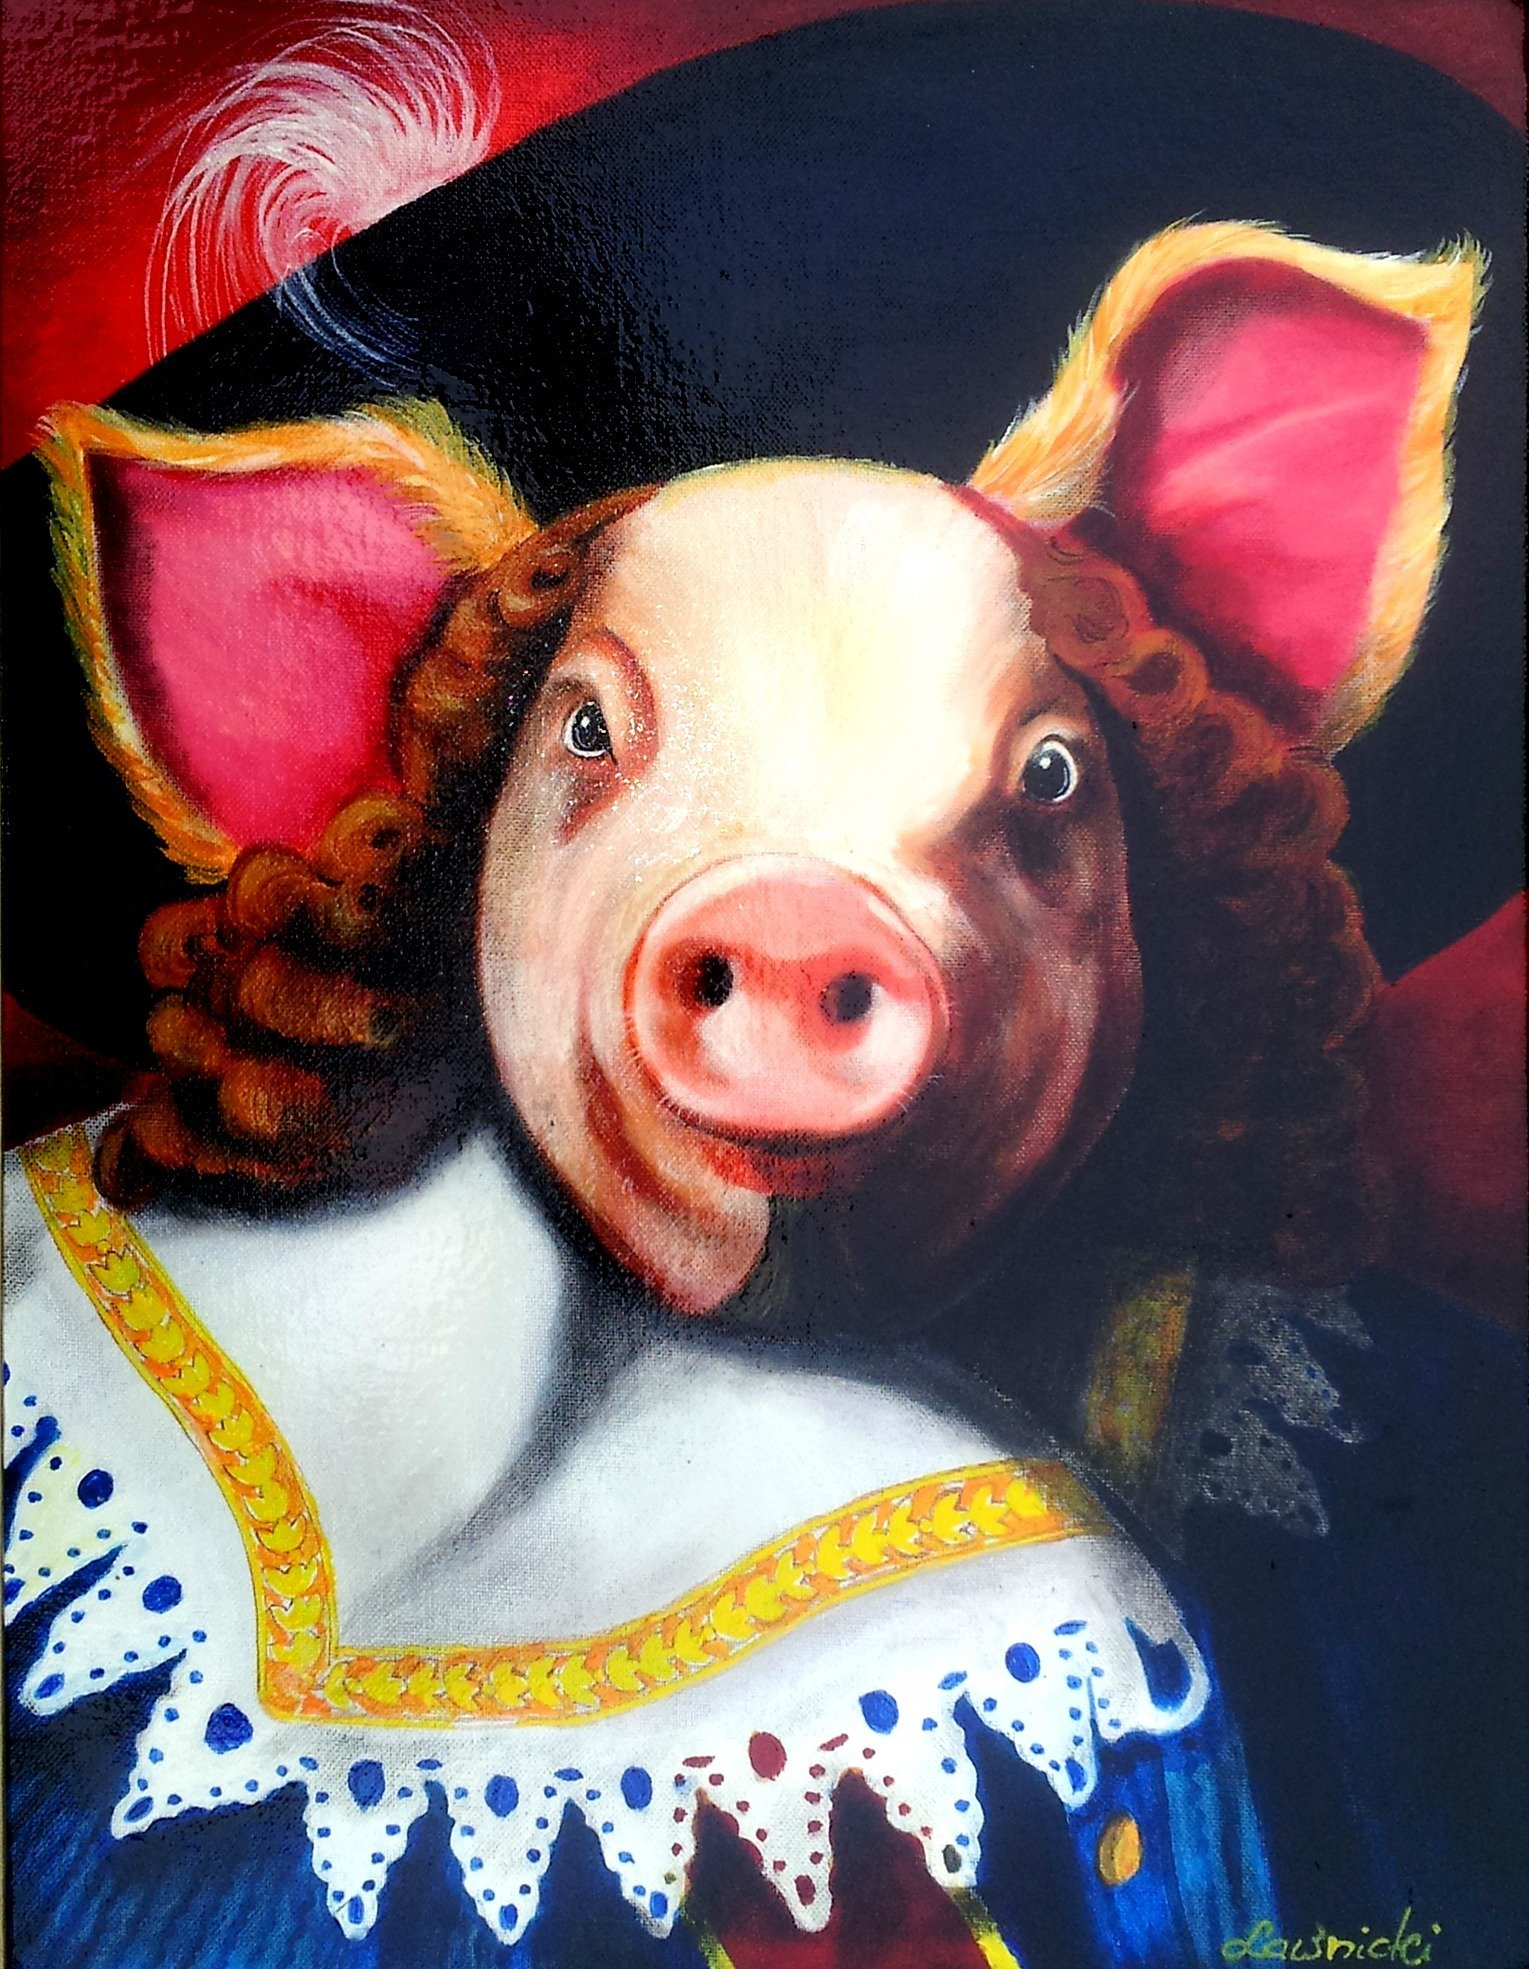 Erick van Pork